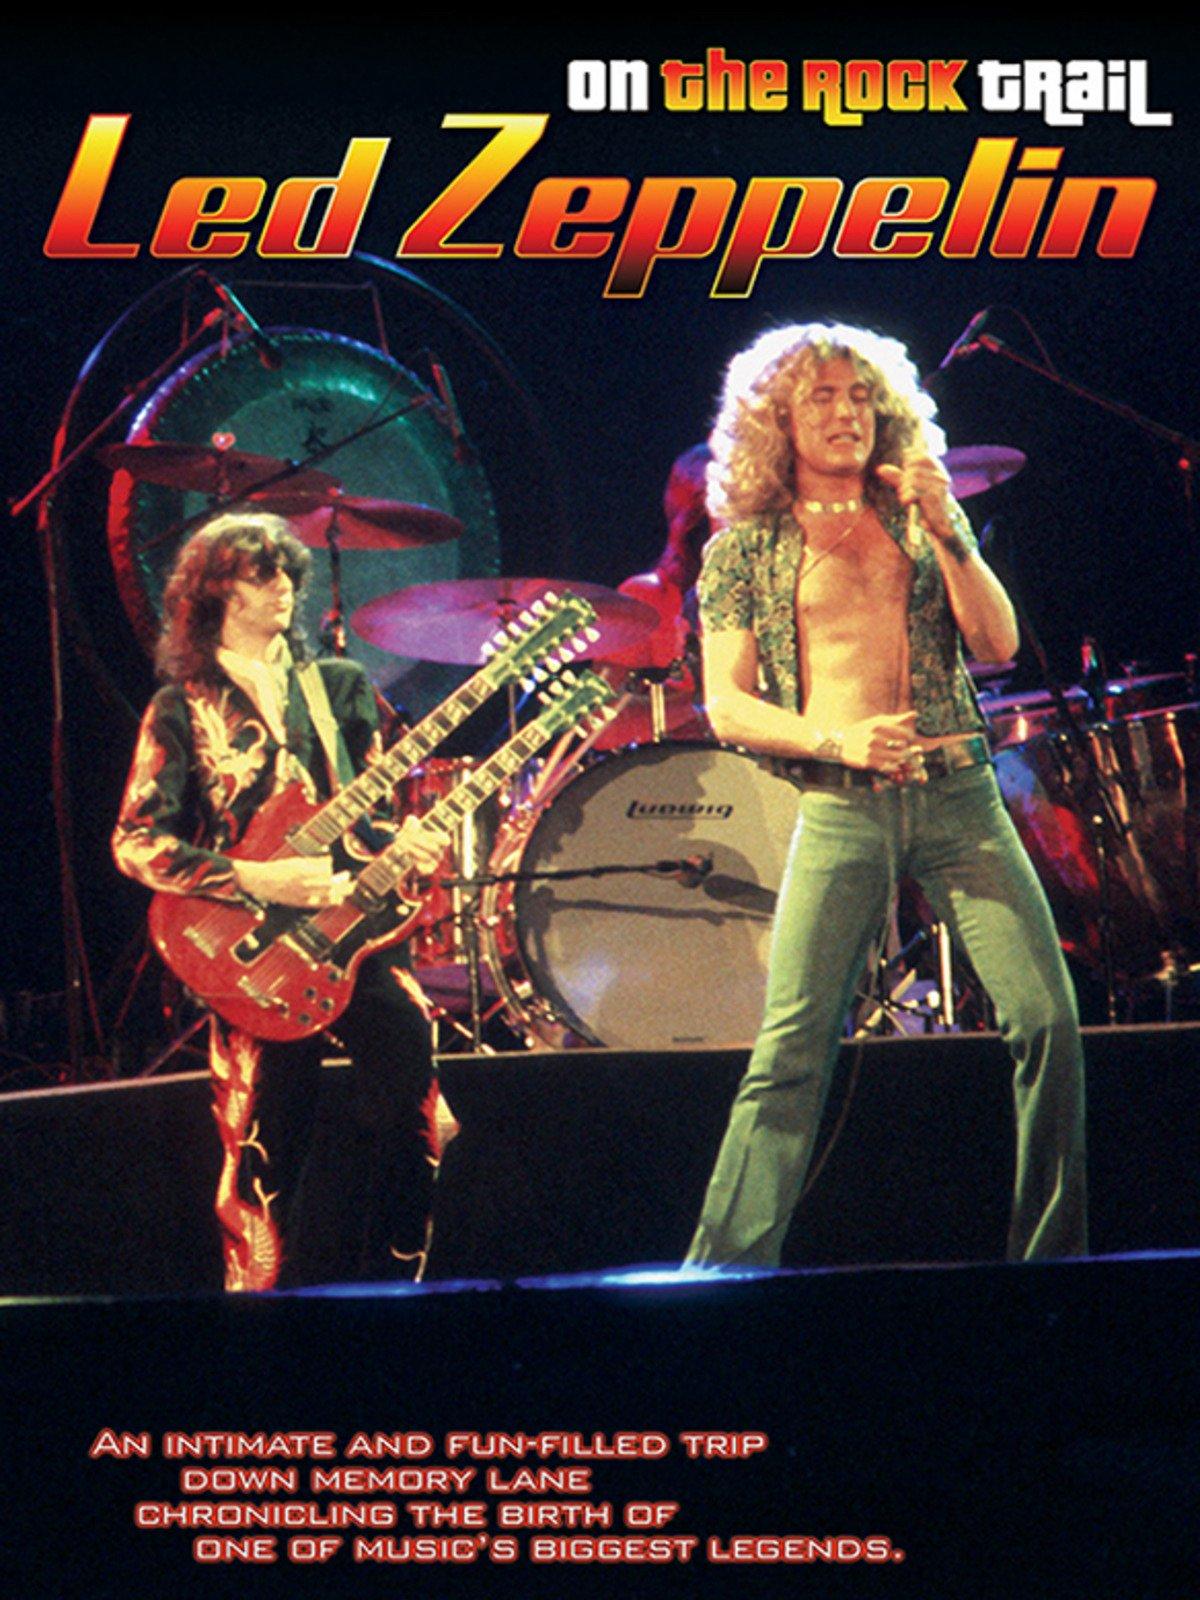 Led Zeppelin: On The Rock Trail